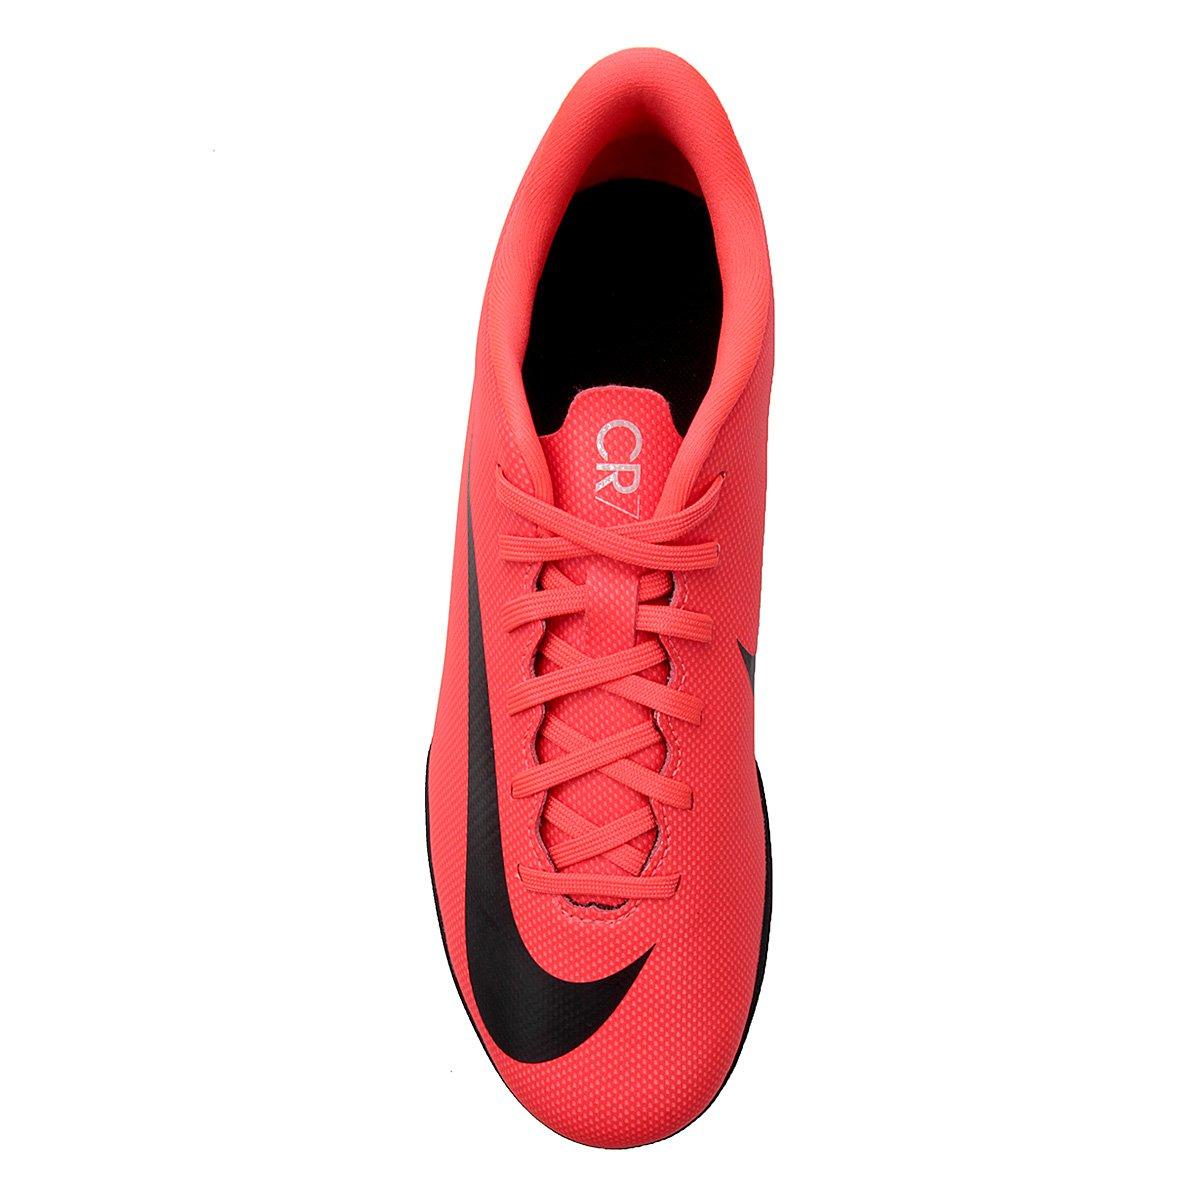 3b05c8a36cf94 Chuteira Society Nike Mercurial Vapor 12 Club CR7 TF